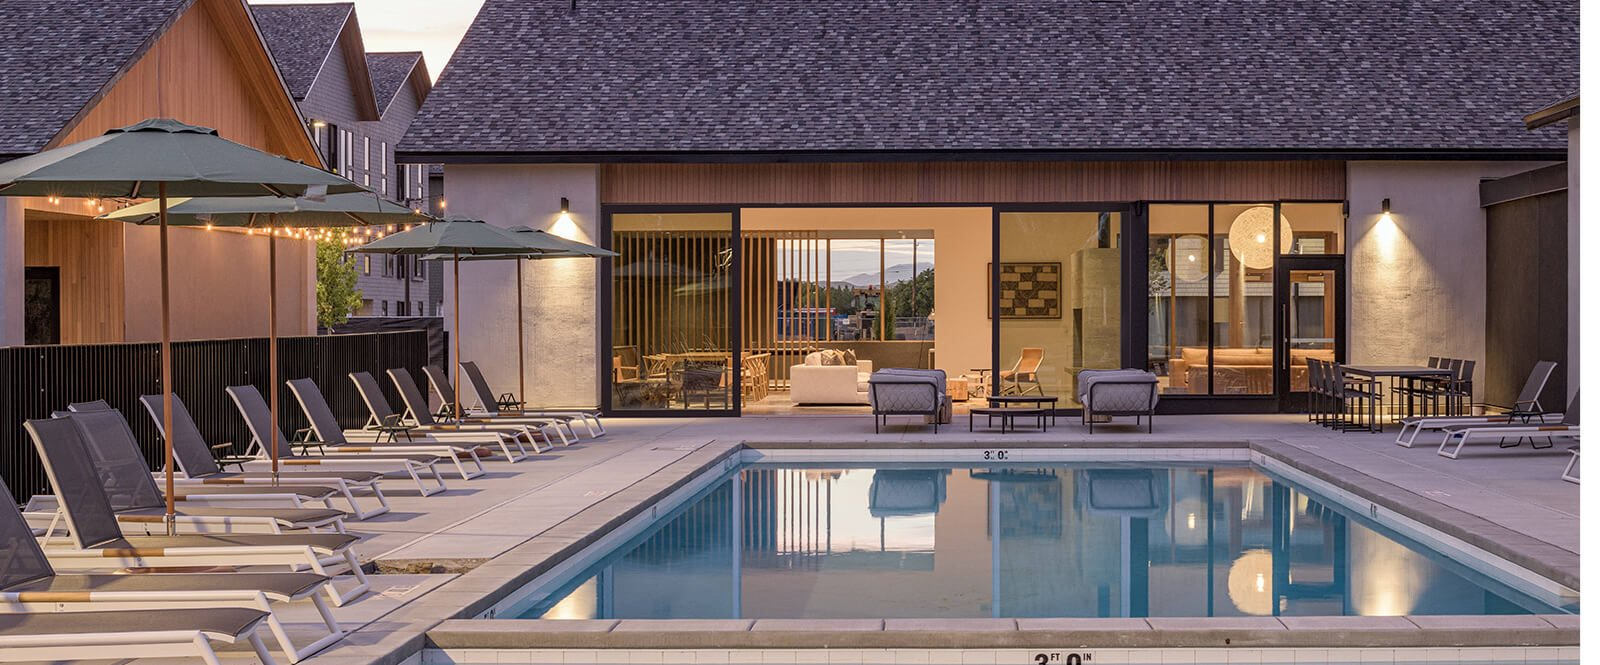 the clara eagle idaho apartments pool